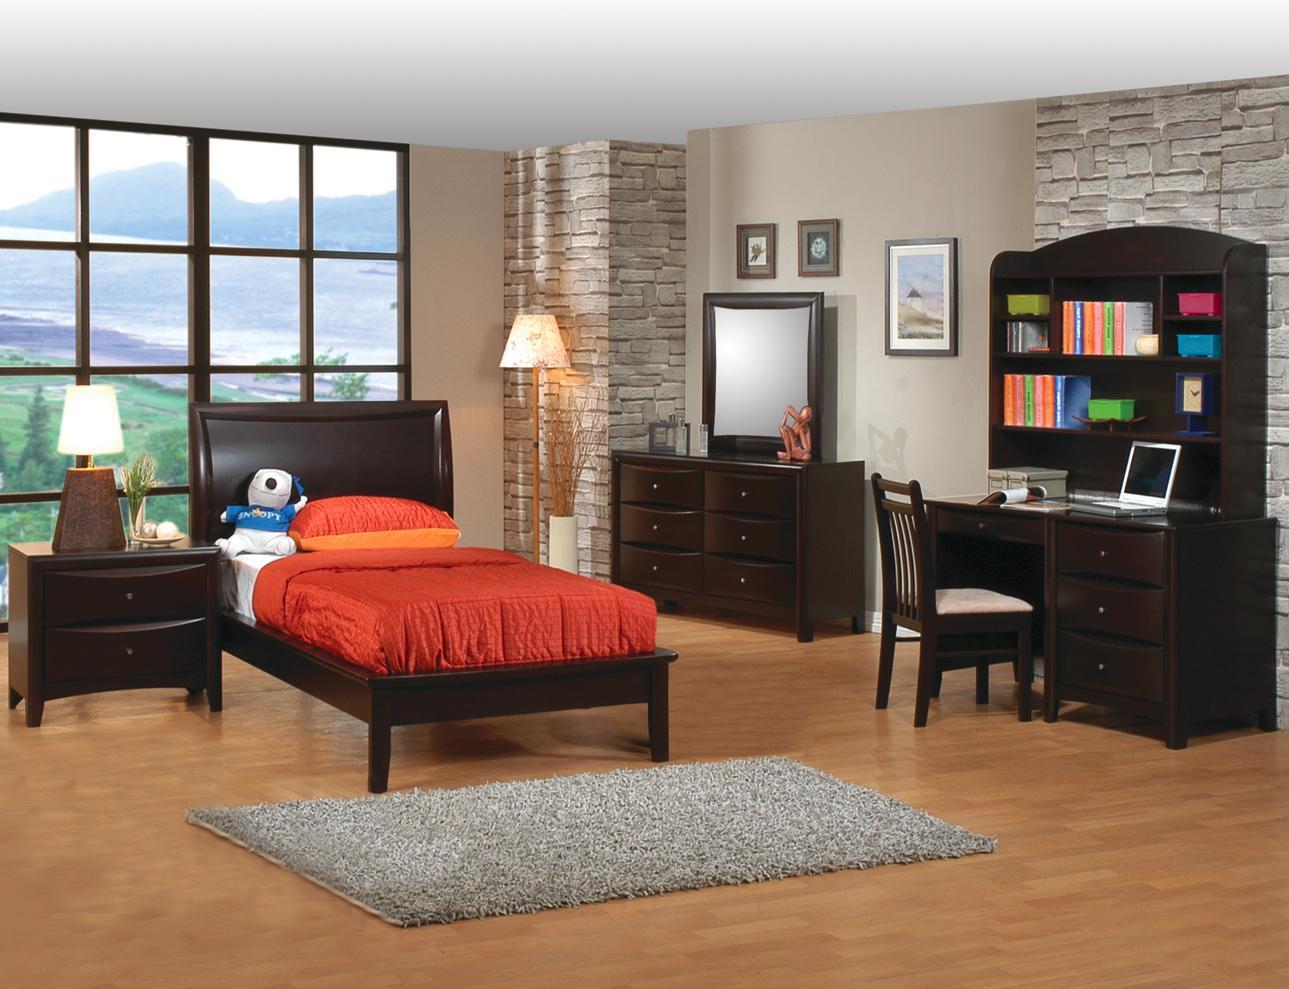 Sleep Concepts Mattress Futon Factory Amish Rustics Furniture